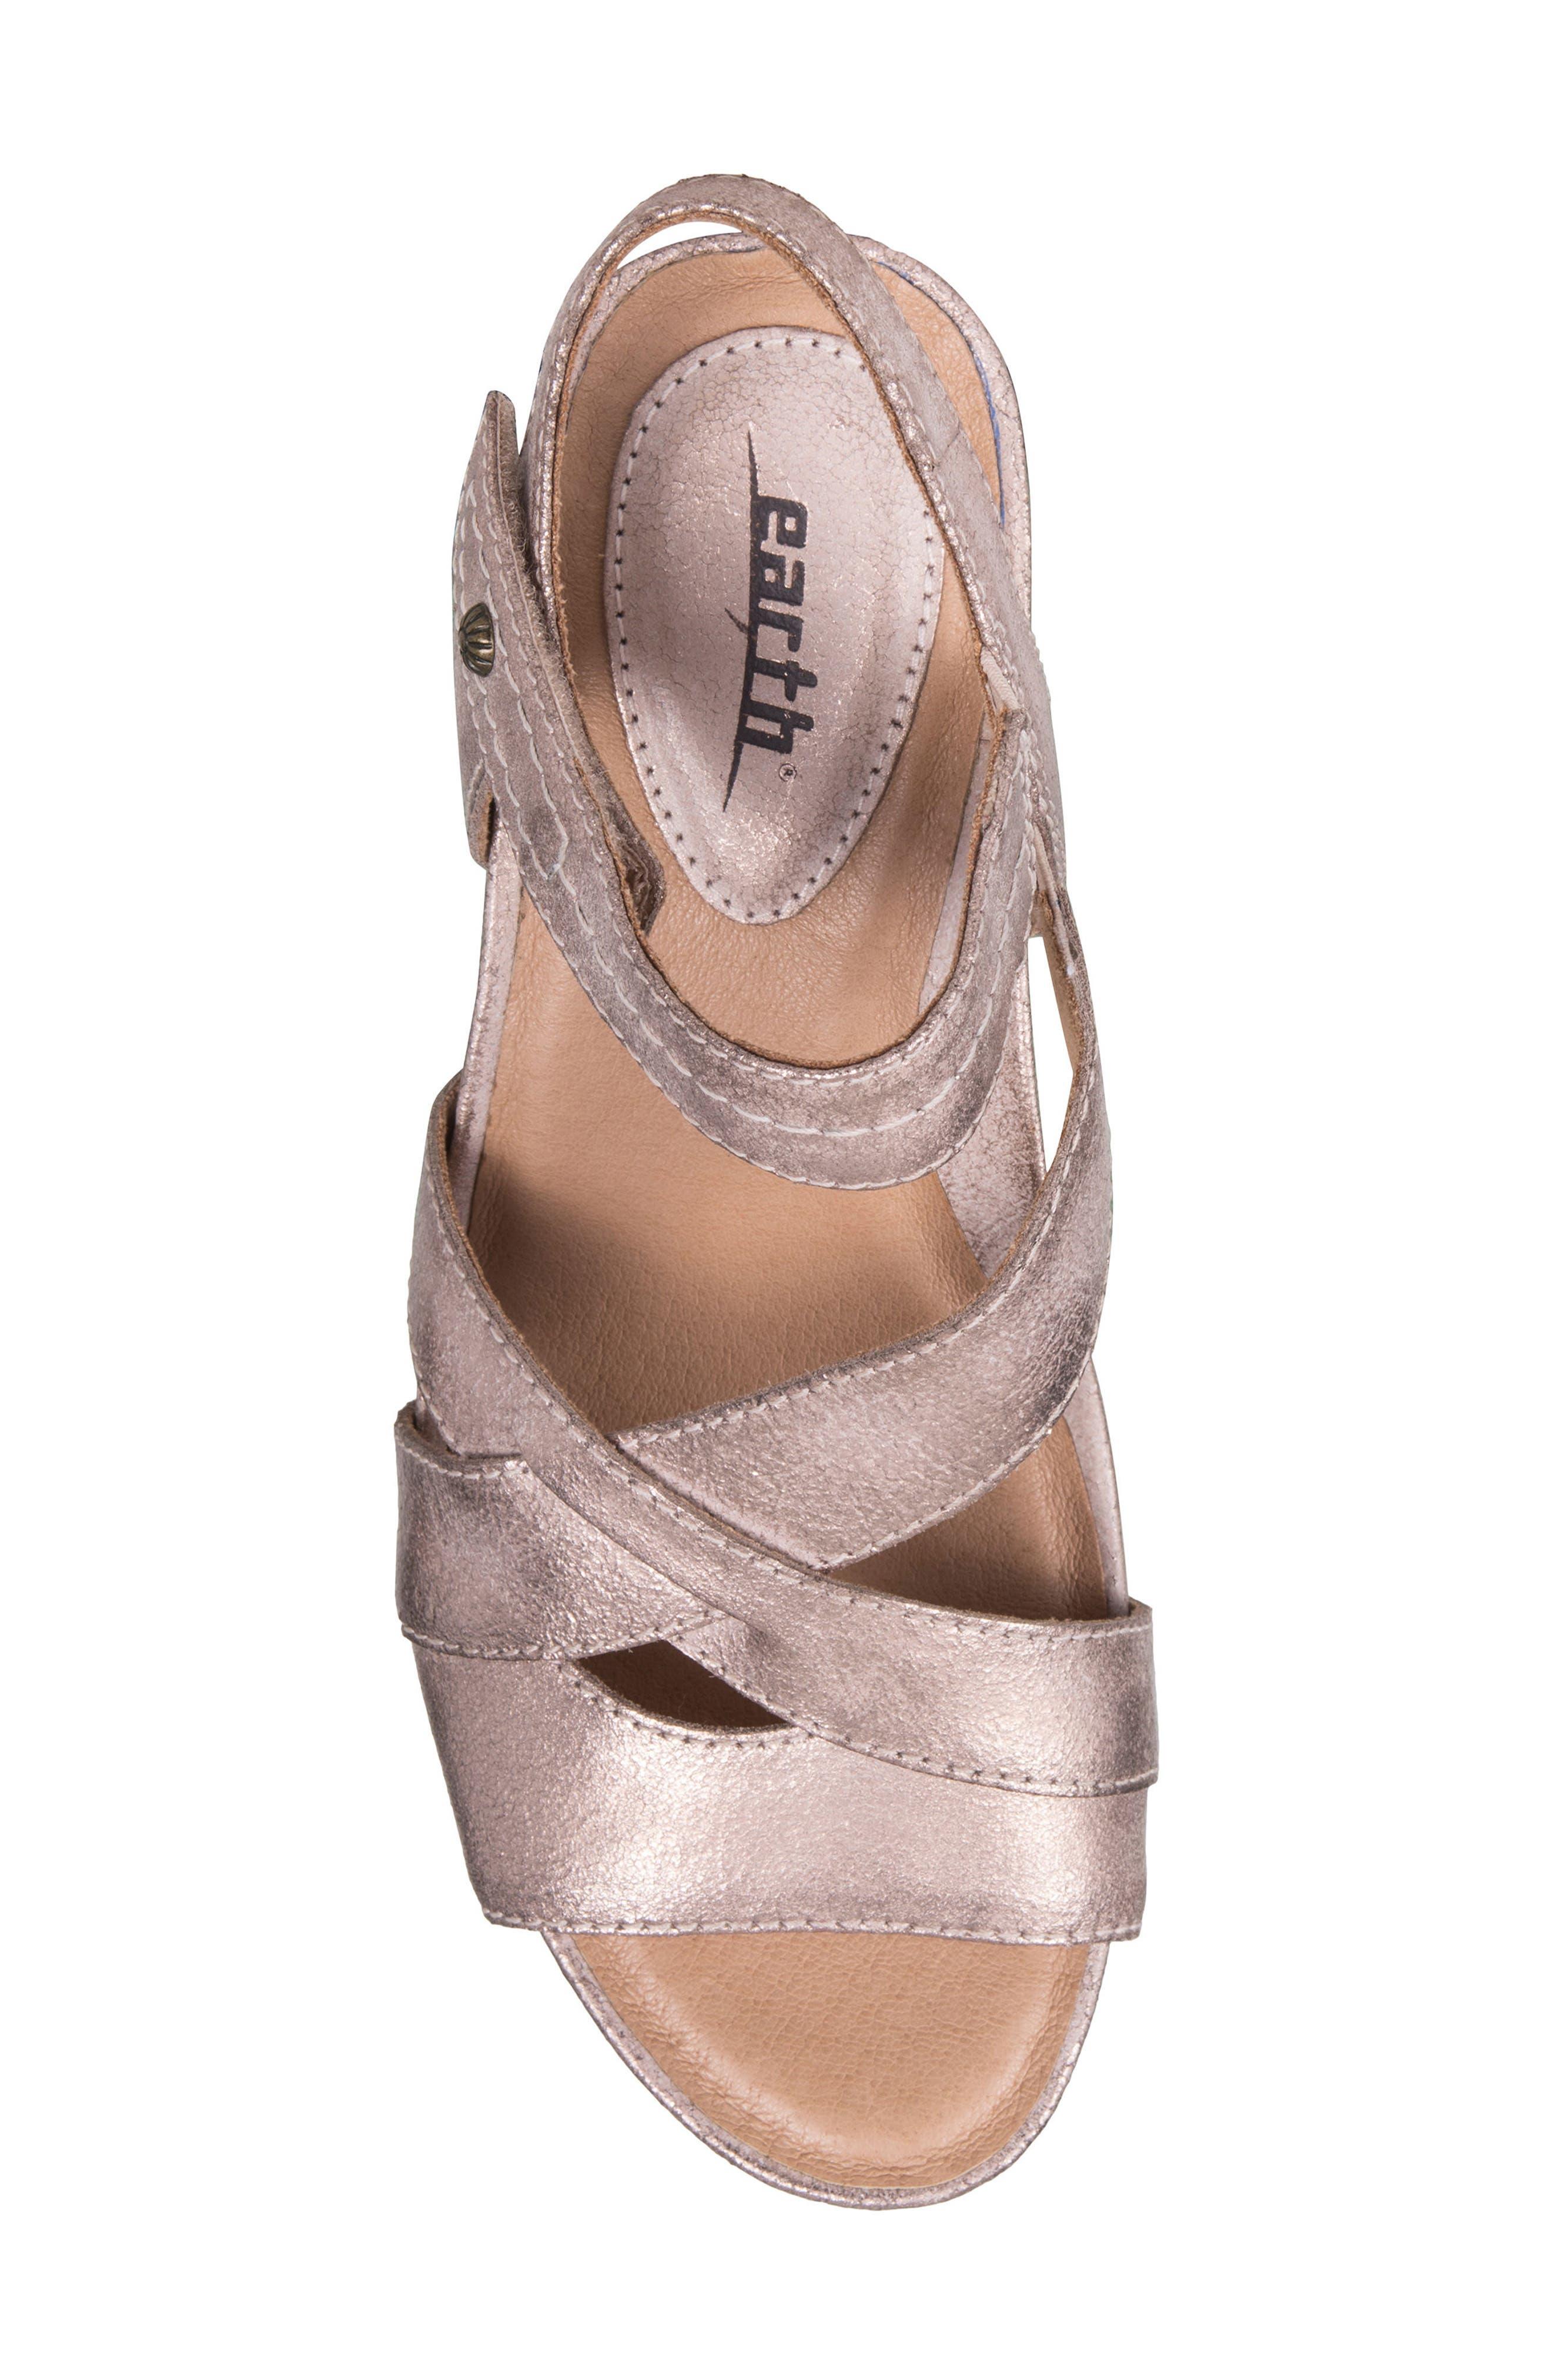 Thistle Wedge Sandal,                             Alternate thumbnail 20, color,